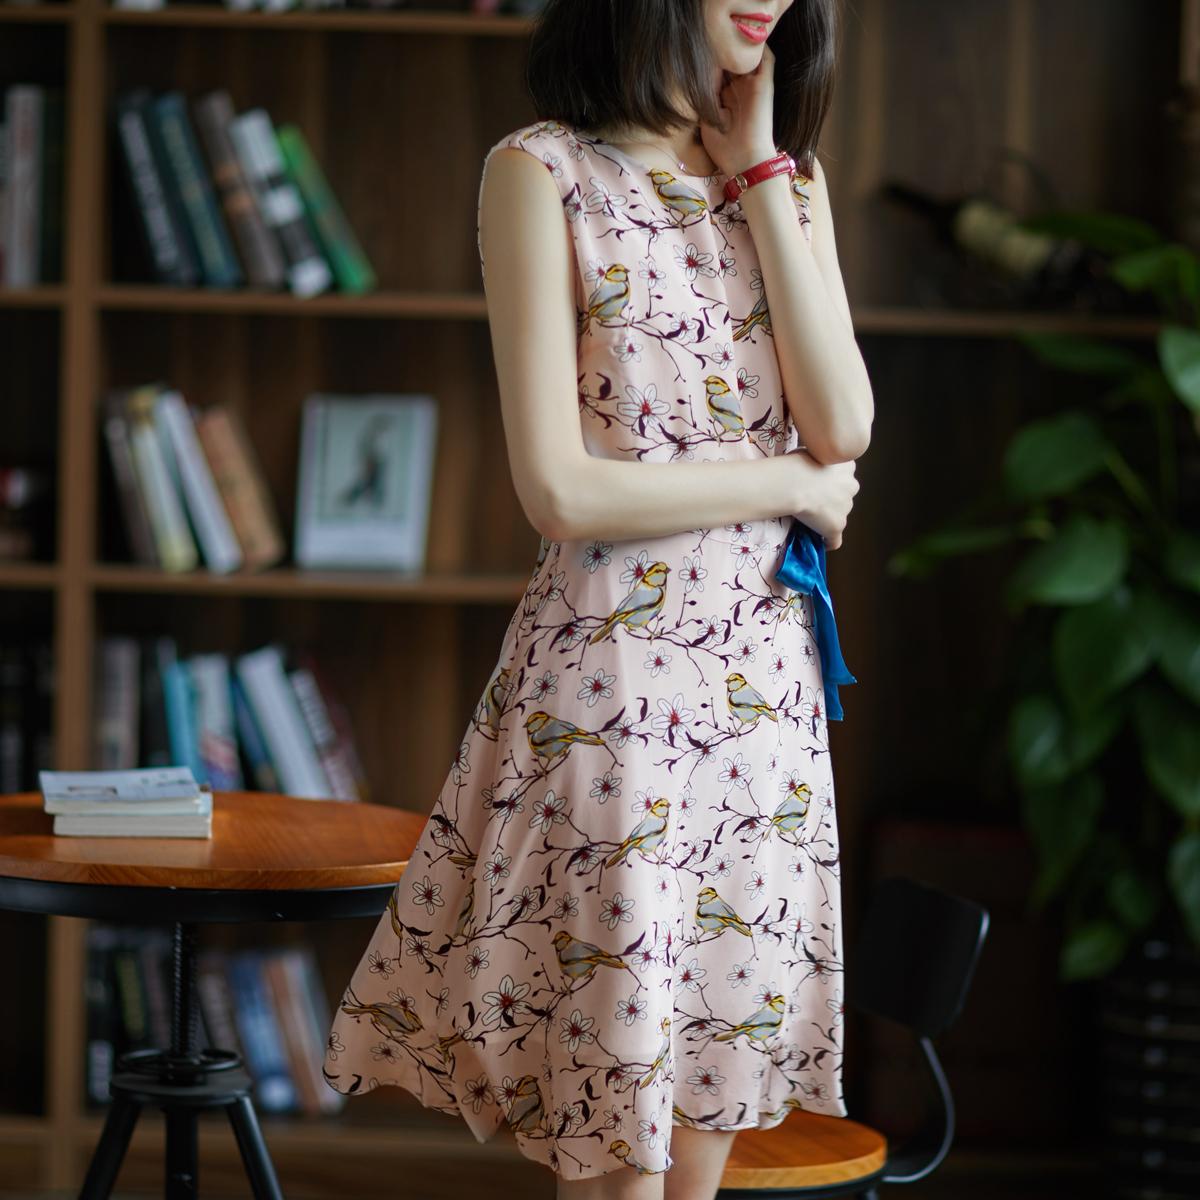 [A545690] 笑涵阁 鸟语花香 腰际系带无袖 桑蚕丝印花连衣裙